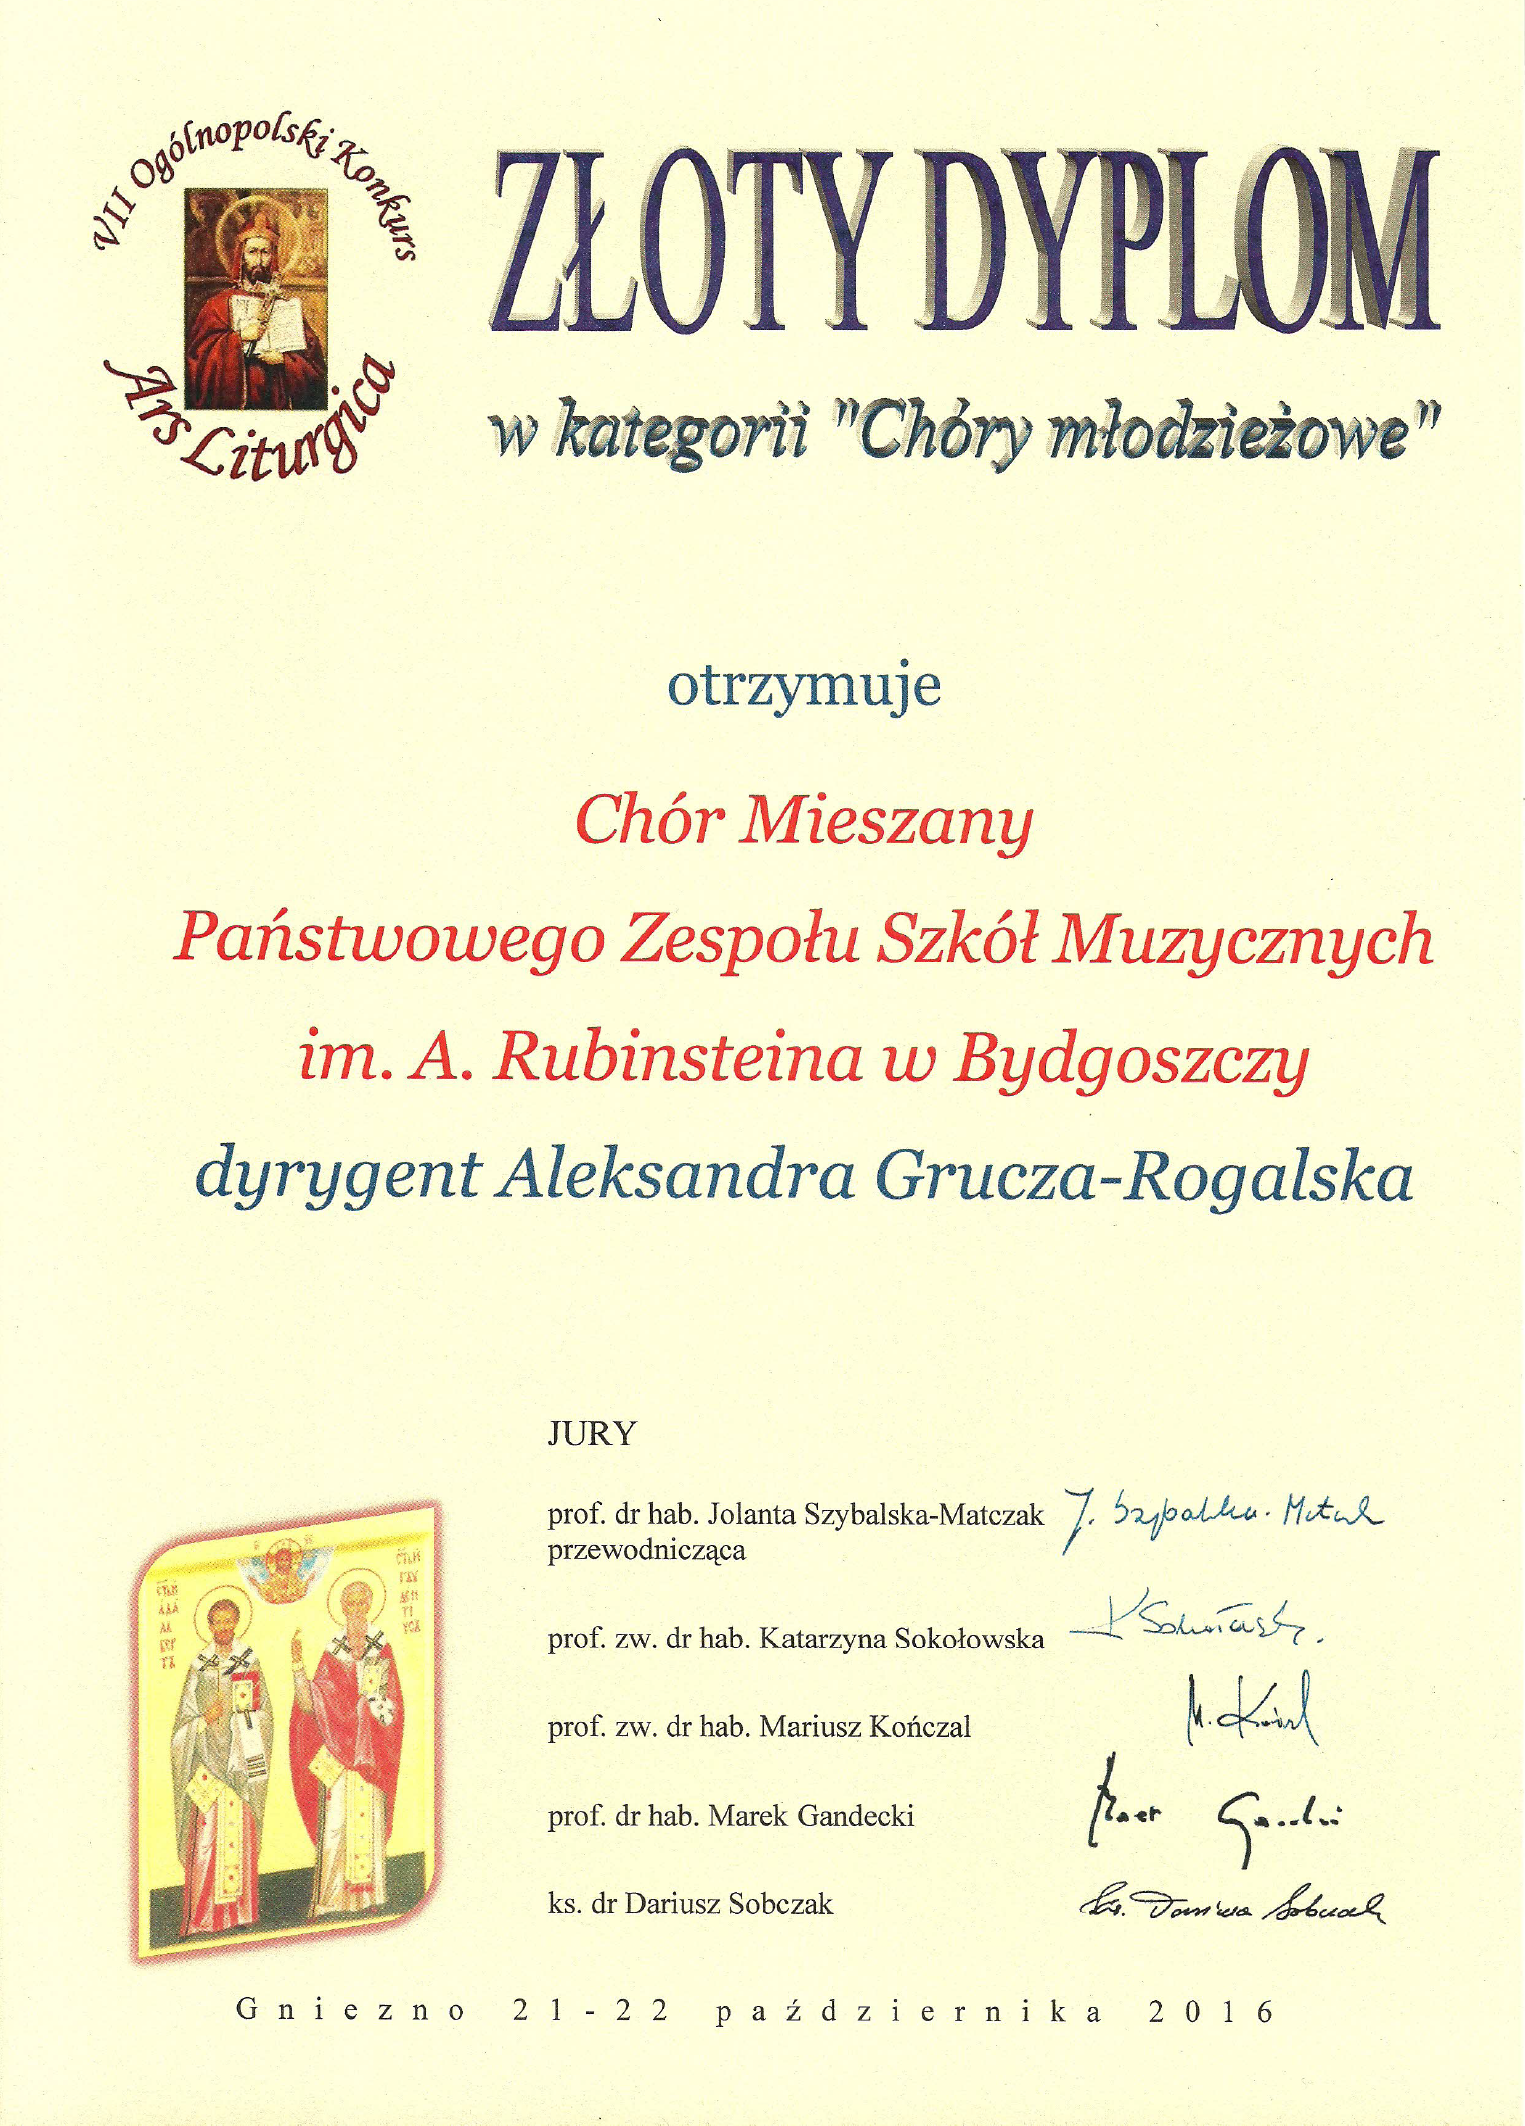 grucza-rogalska_dyplom